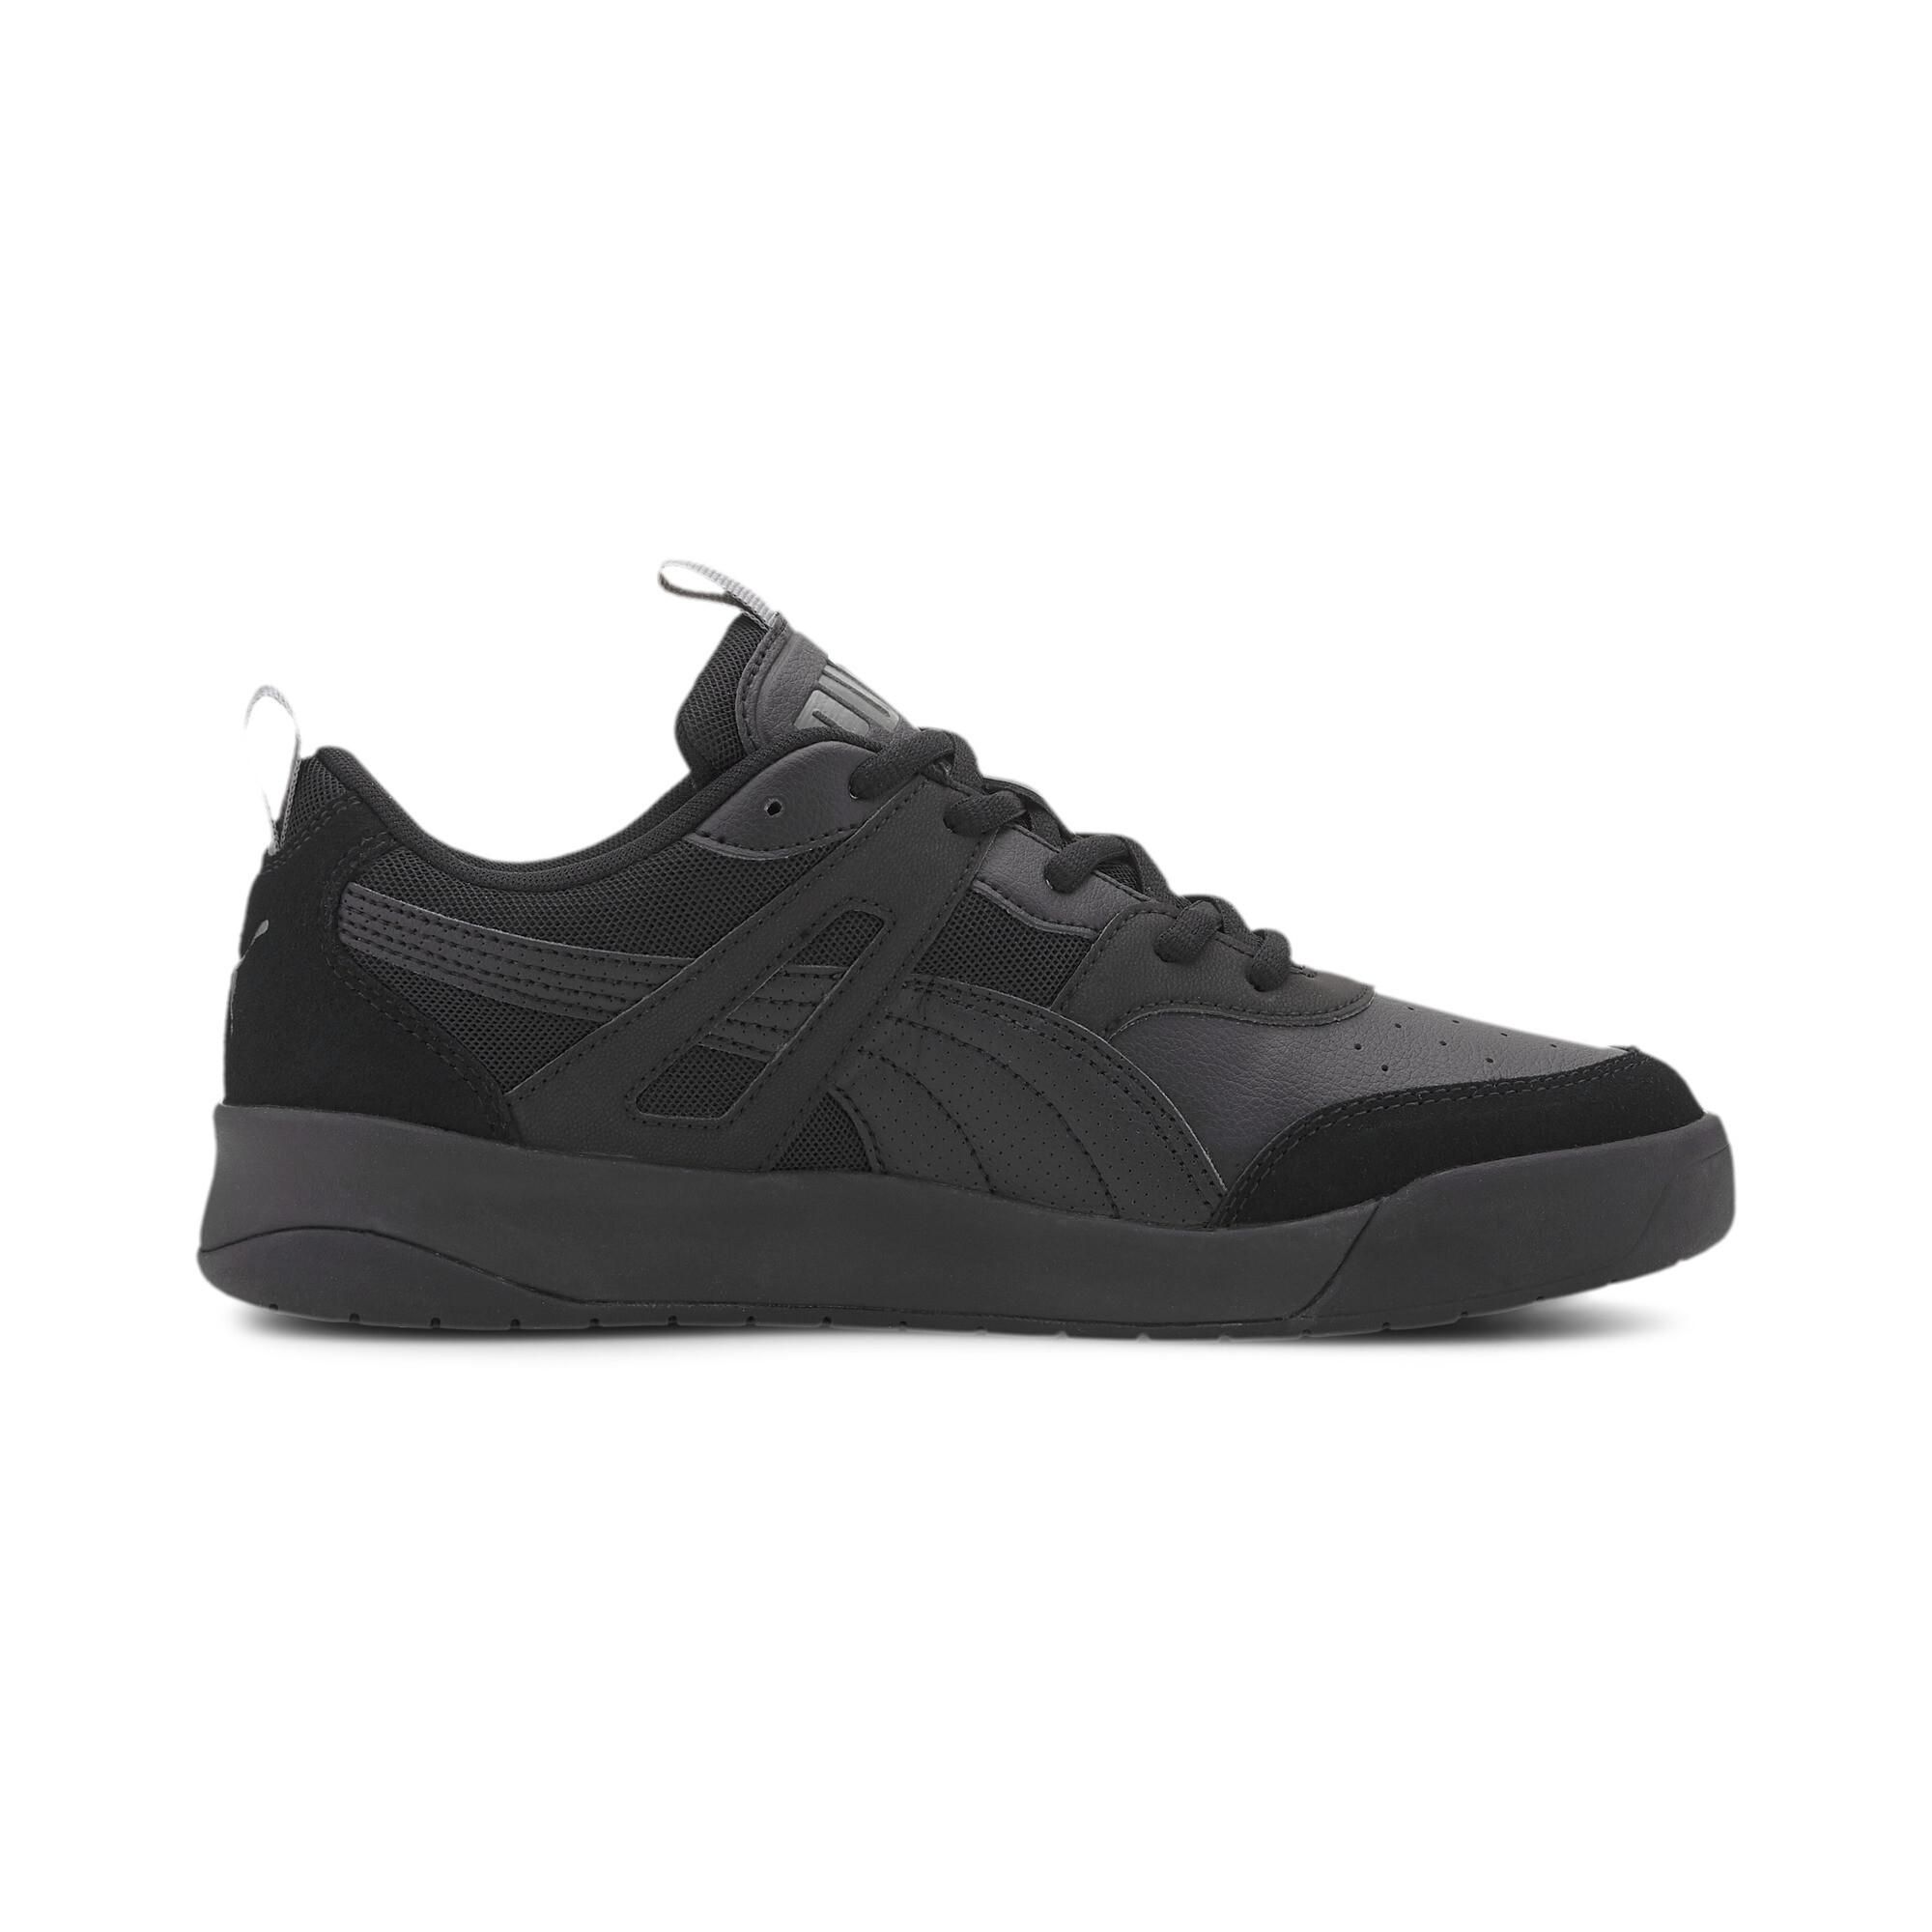 miniature 7 - Puma Men's Backcourt Sneakers